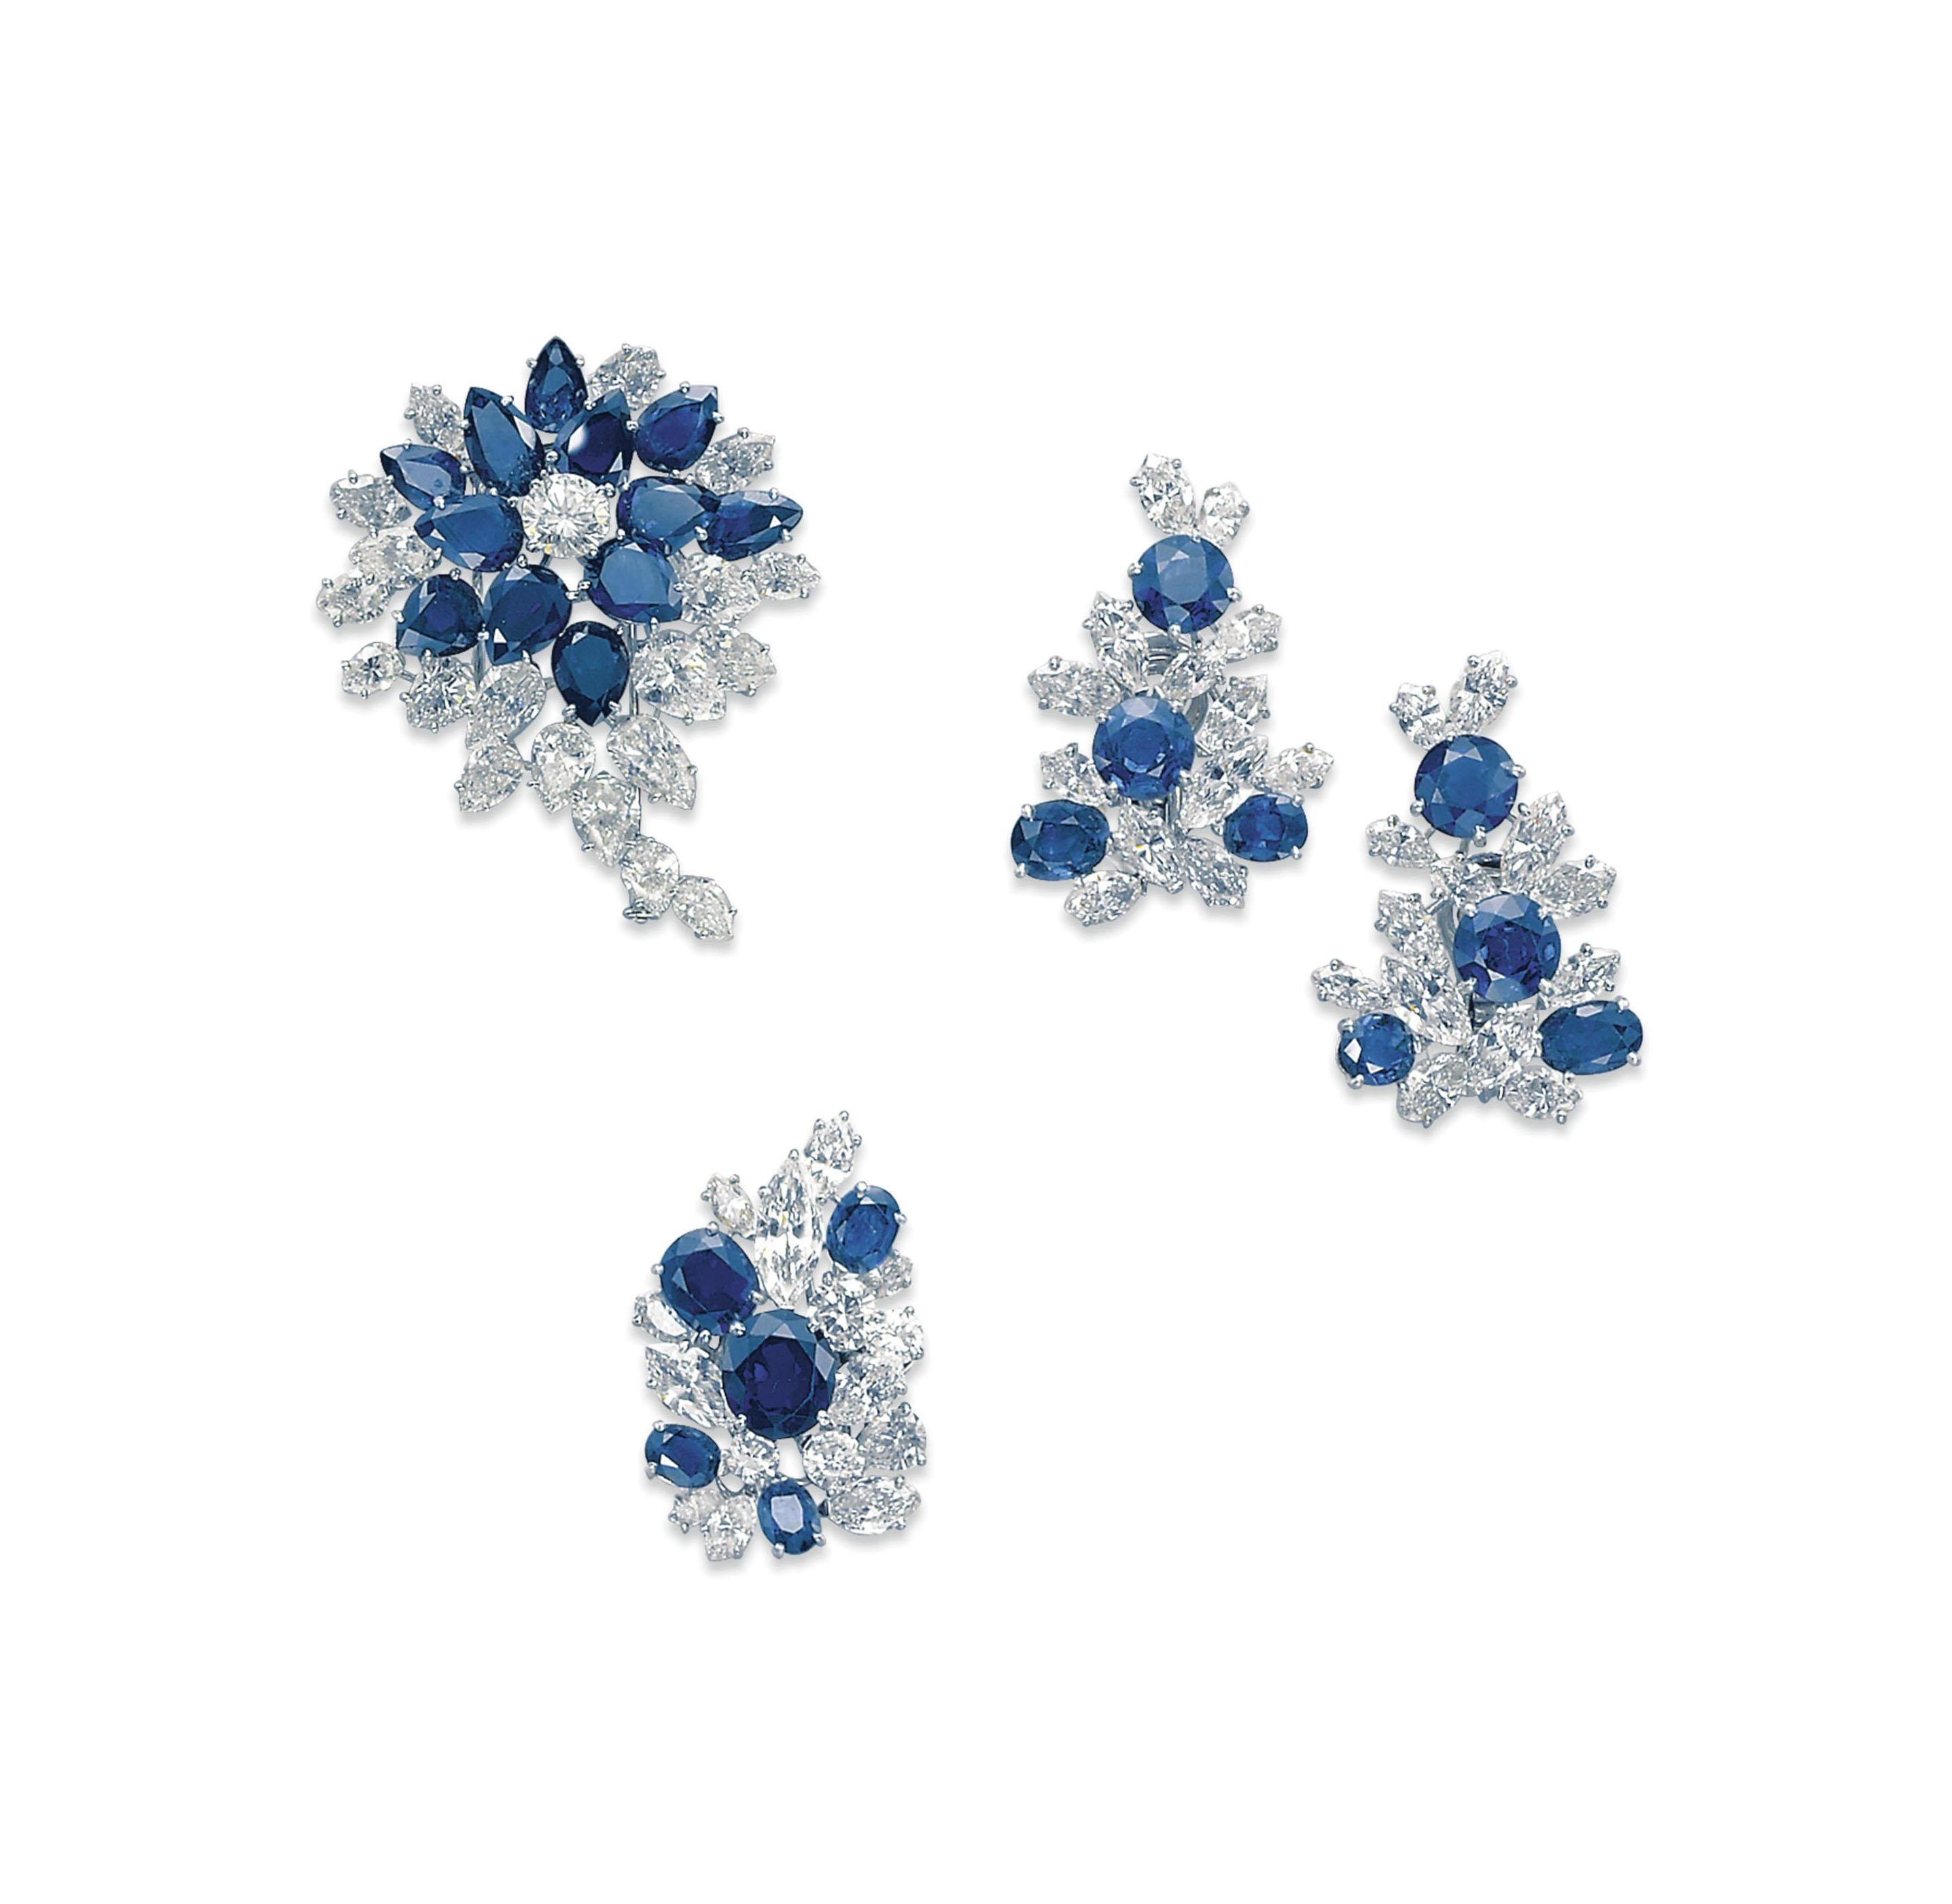 A Set Of Sapphire And Diamond Jewellery By Faraone